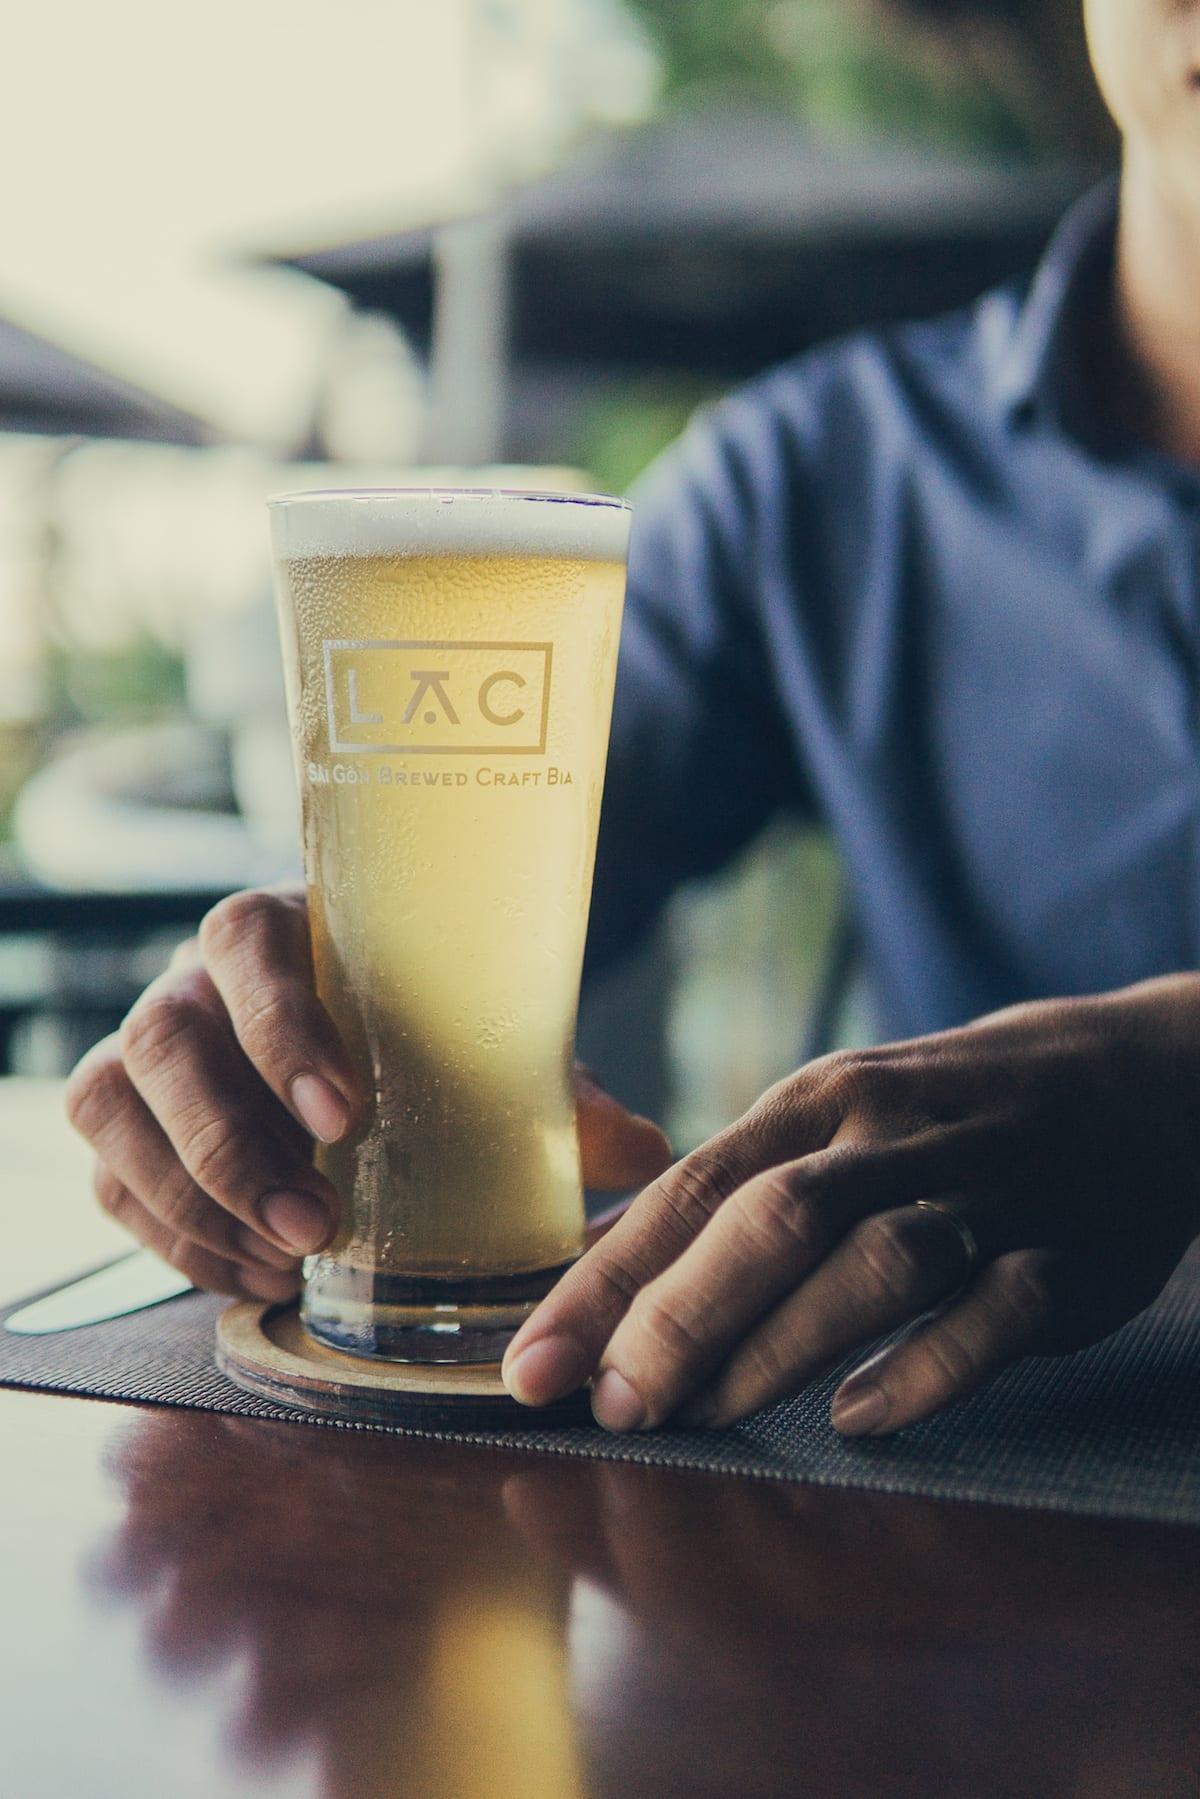 LAC beer